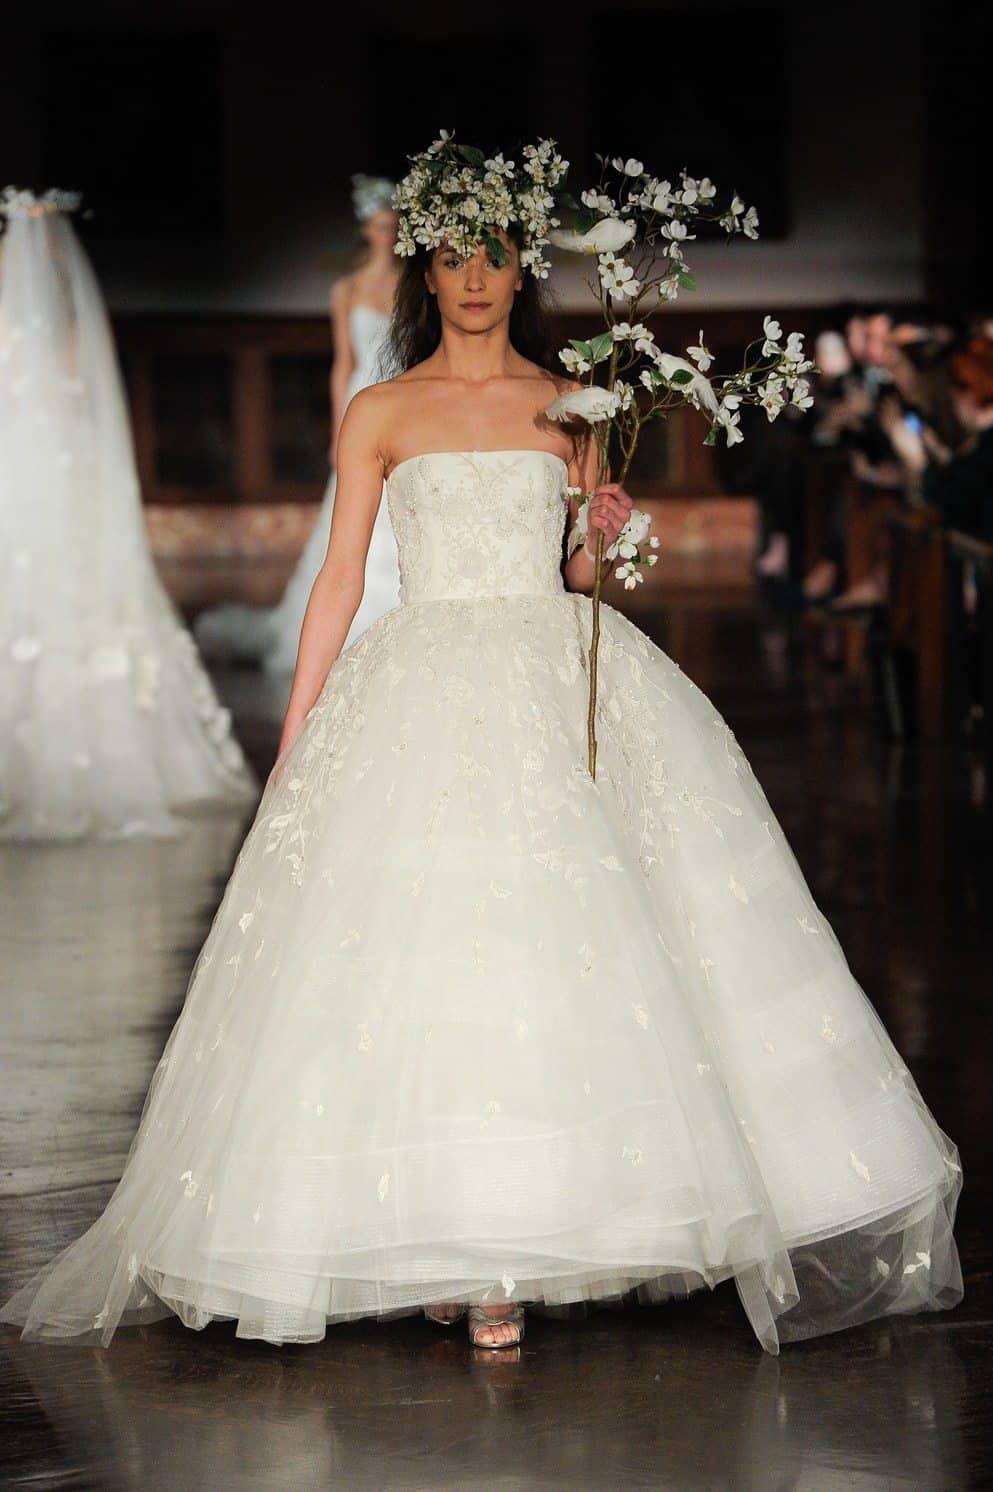 baile-reem-acra-wedding-dresses-spring-2019-018